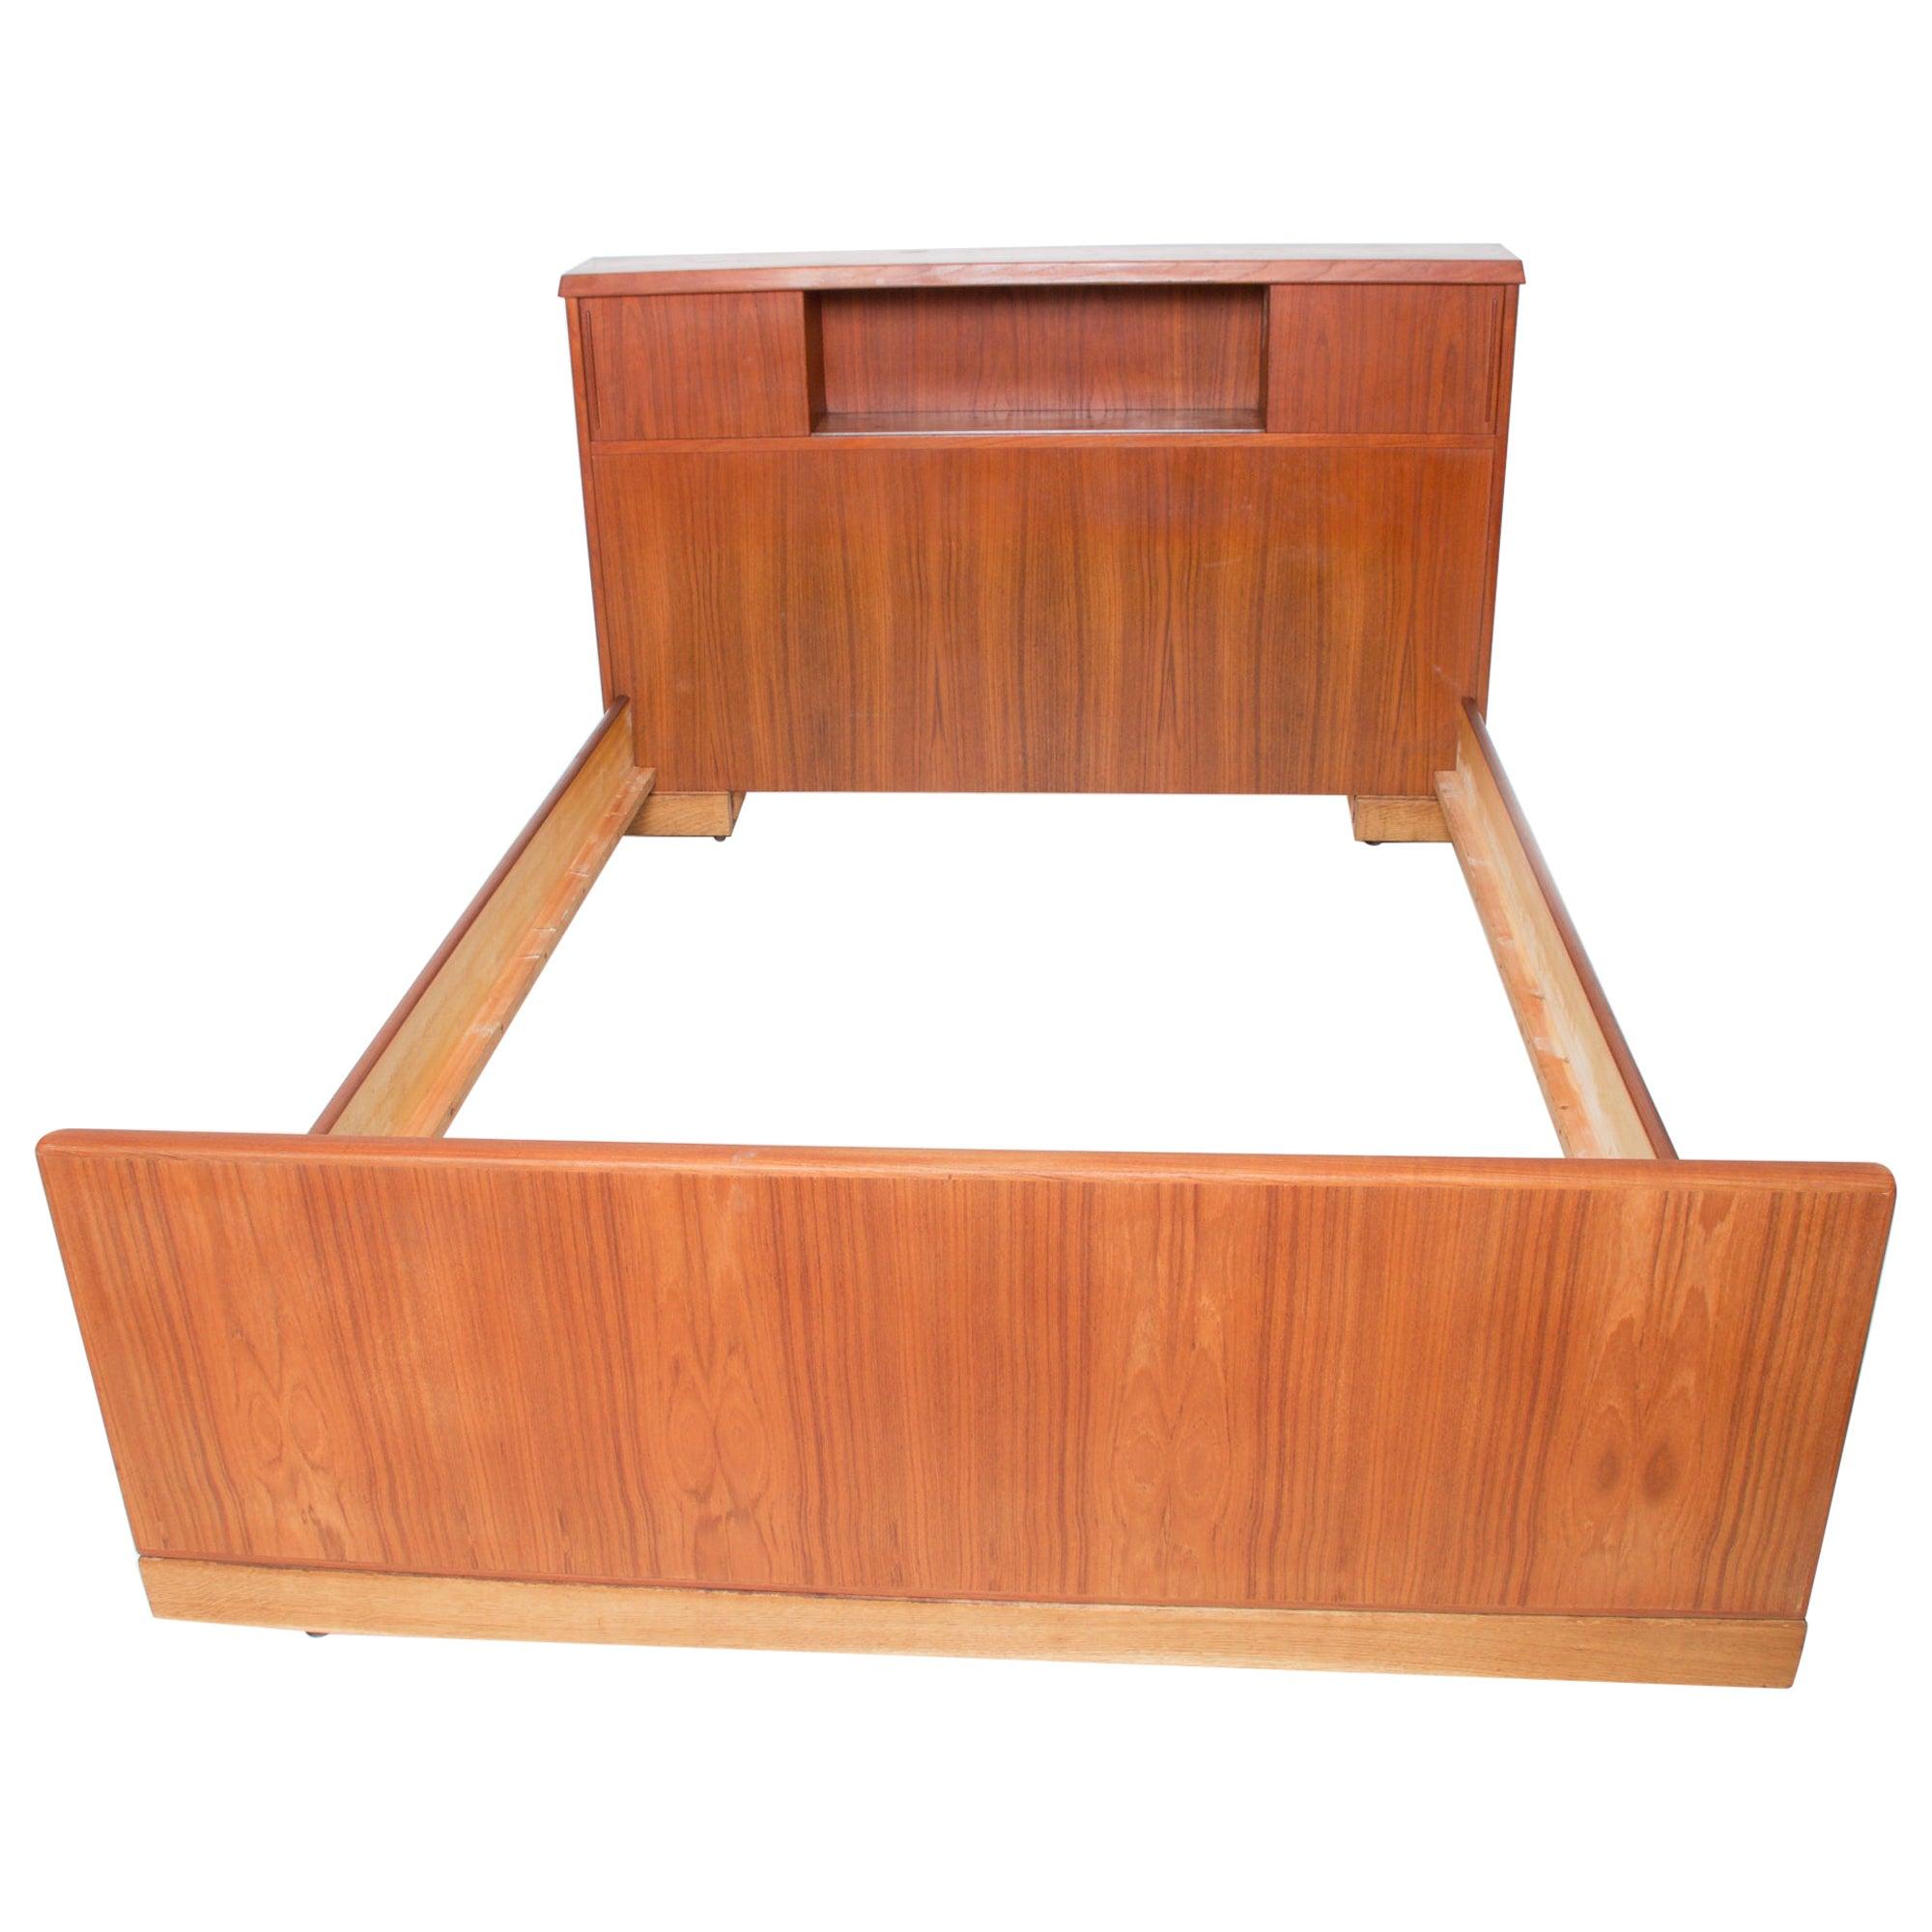 Scandinavian Modern Teak Wood Bed Thick Tall Headboard Design in Full 1960s